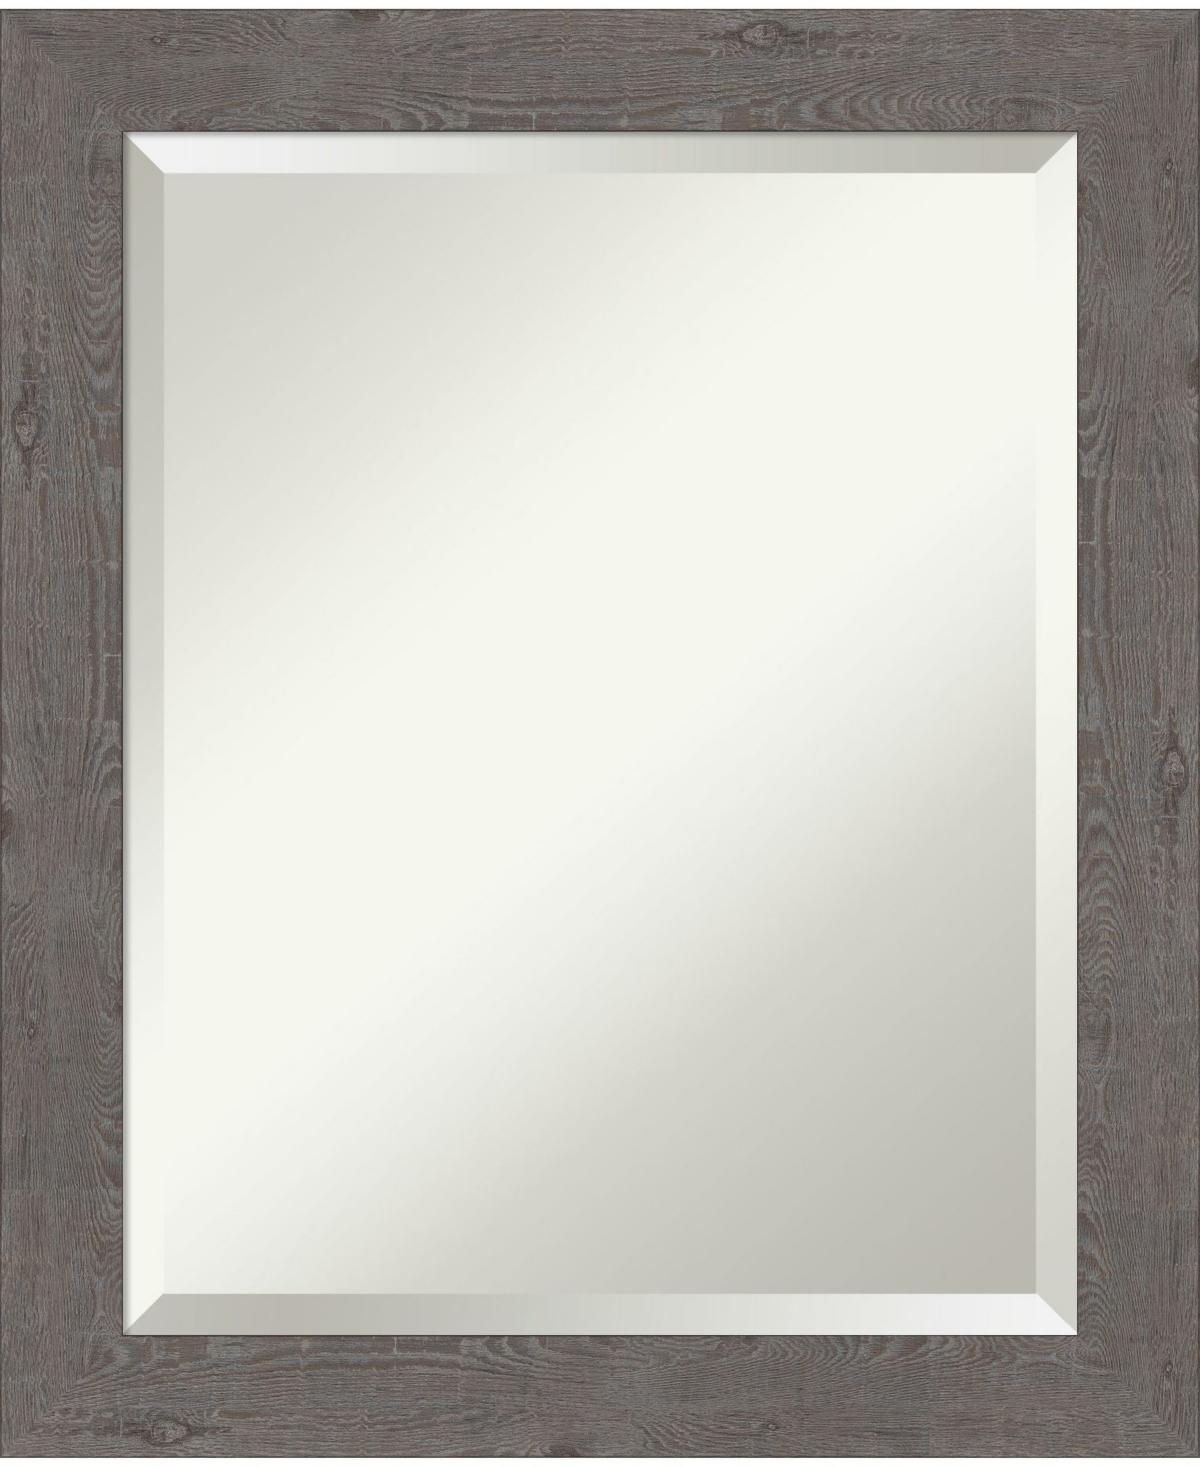 Amanti Art Rustic Plank Framed Bathroom Vanity Wall Mirror, 19.25